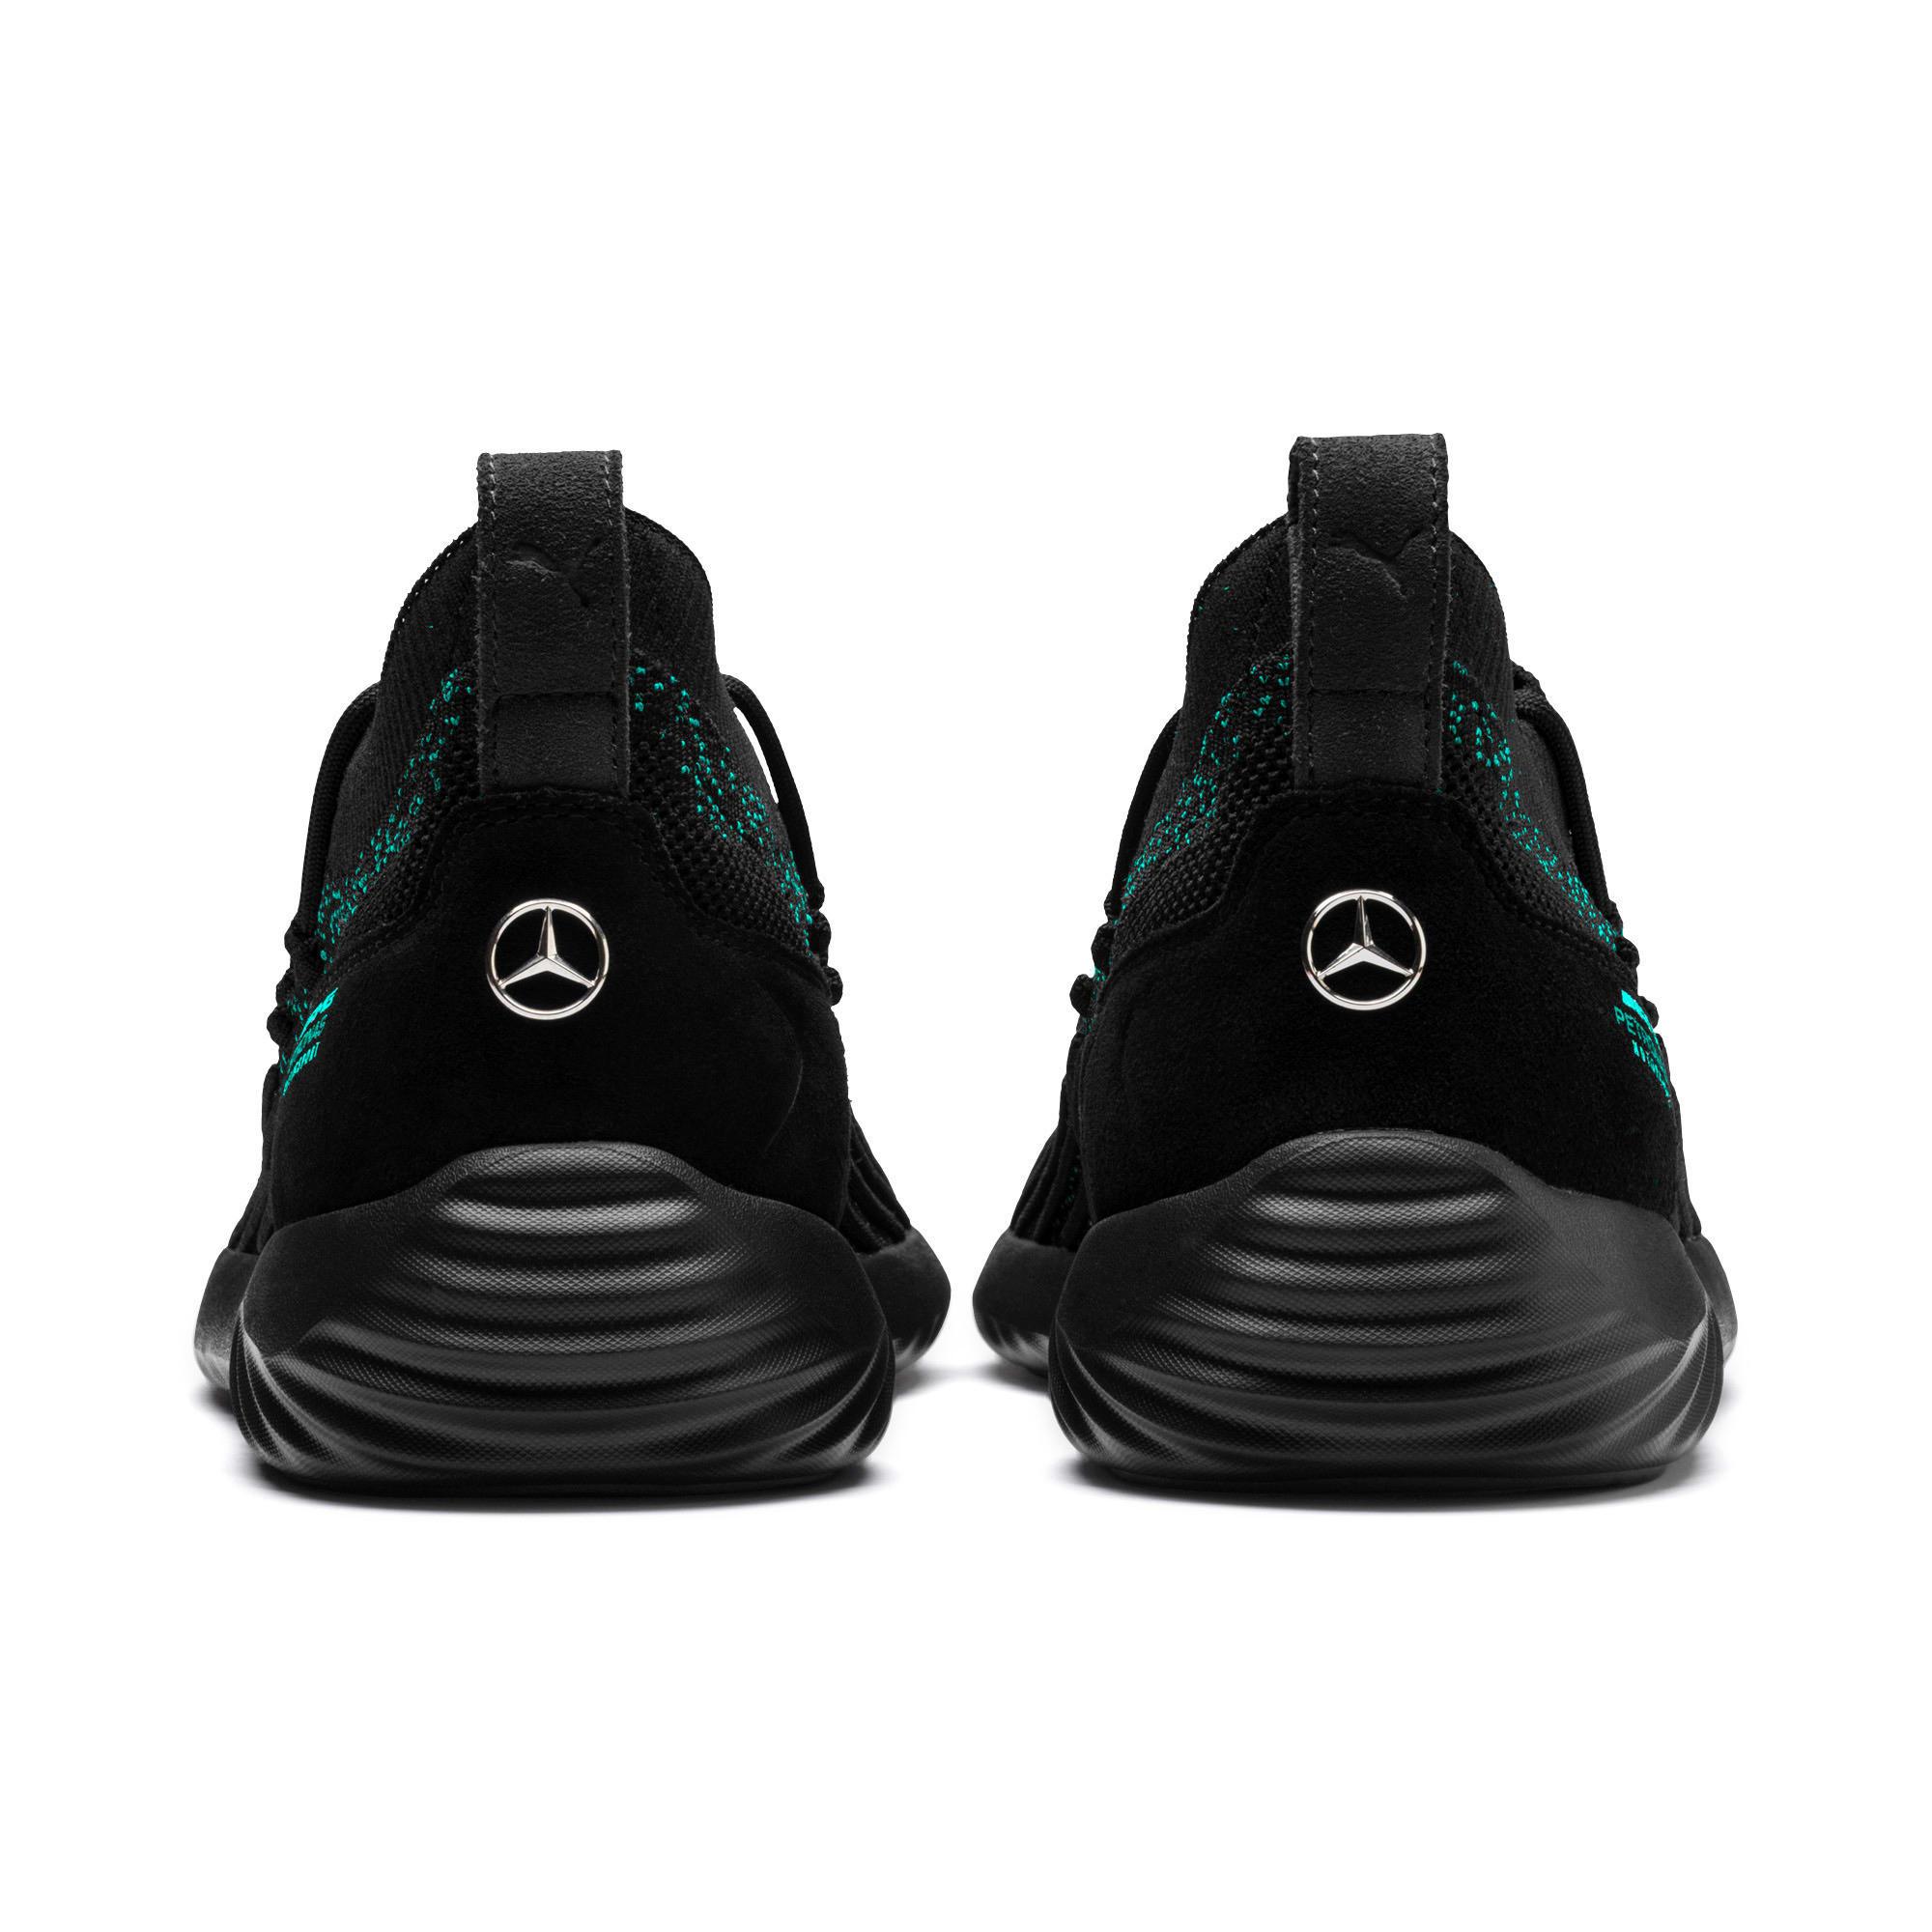 Thumbnail 3 of Mercedes AMG Petronas SpeedCat FUSEFIT Trainers, Puma Black-Spectra Green-Blk, medium-IND